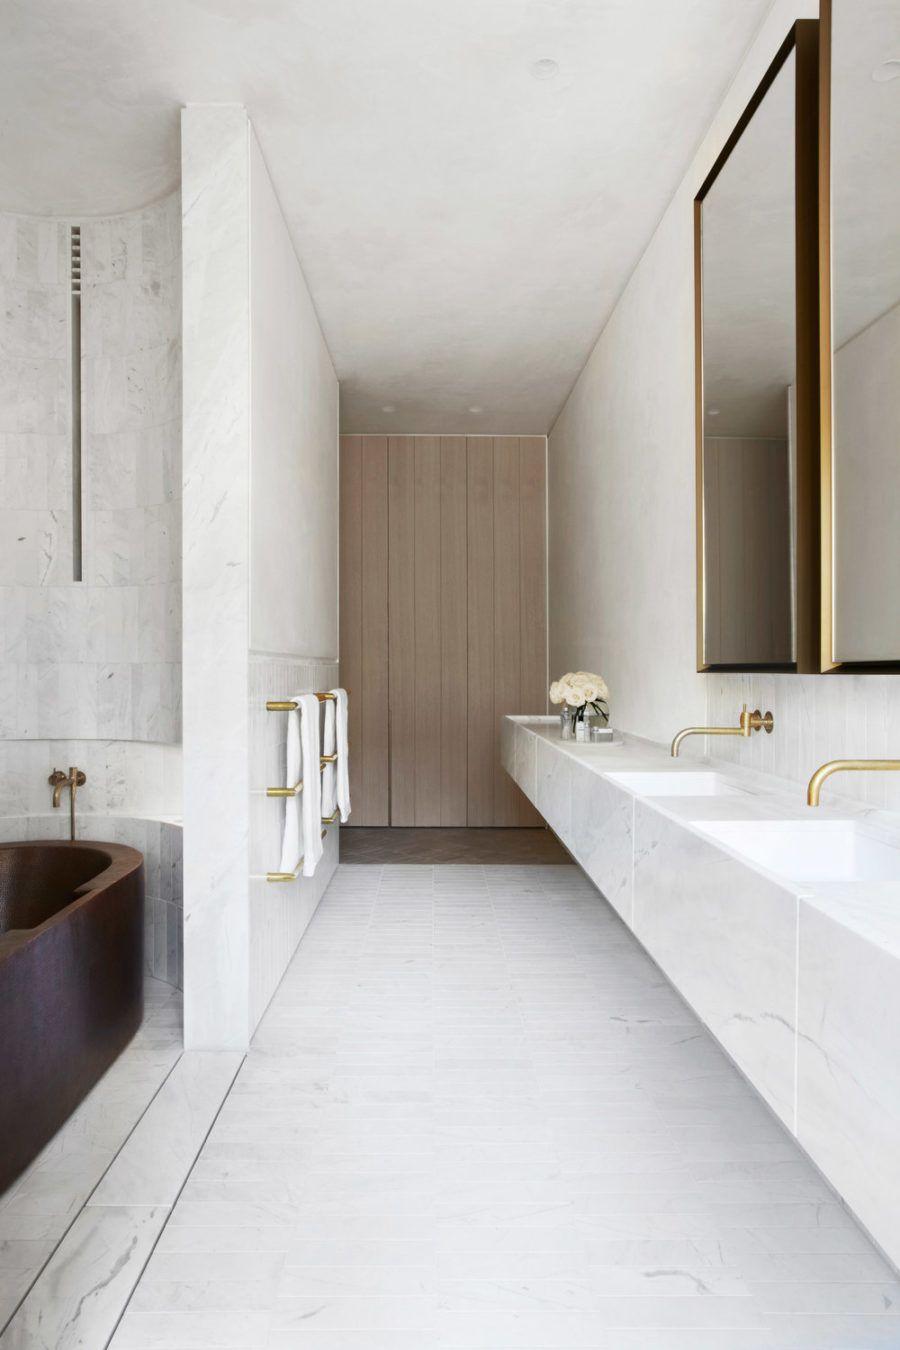 Big Bathroom Mirror Trend in Real Interiors | Помещения: Ванная ...